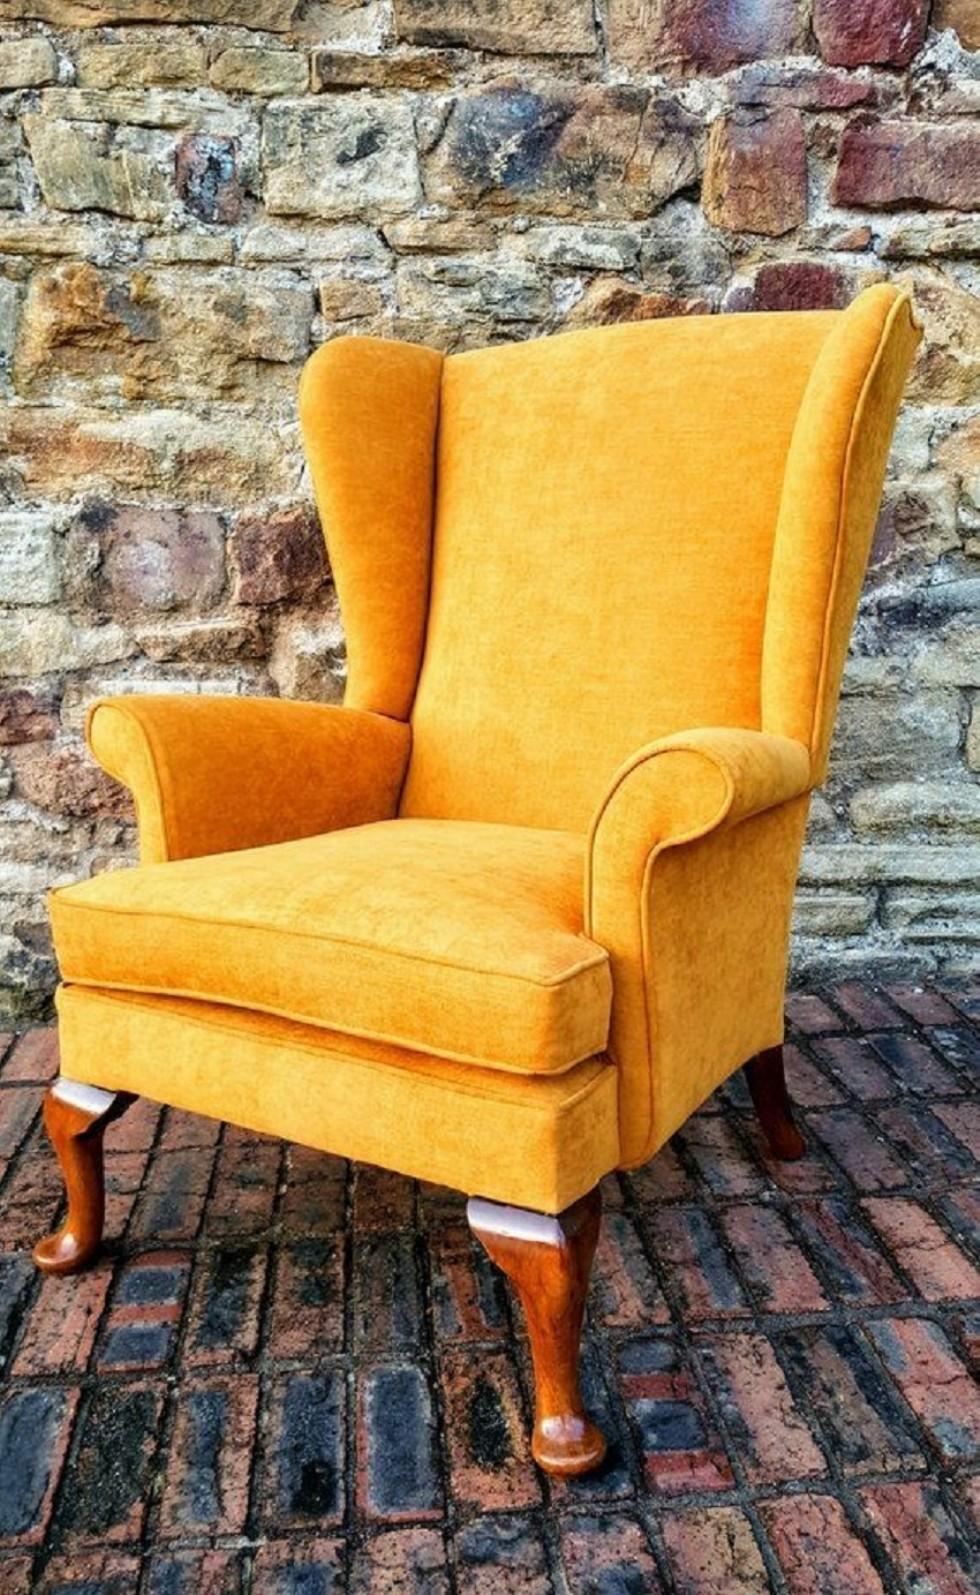 Kodu: 9438 - Chesterfield Chair Sofa Models